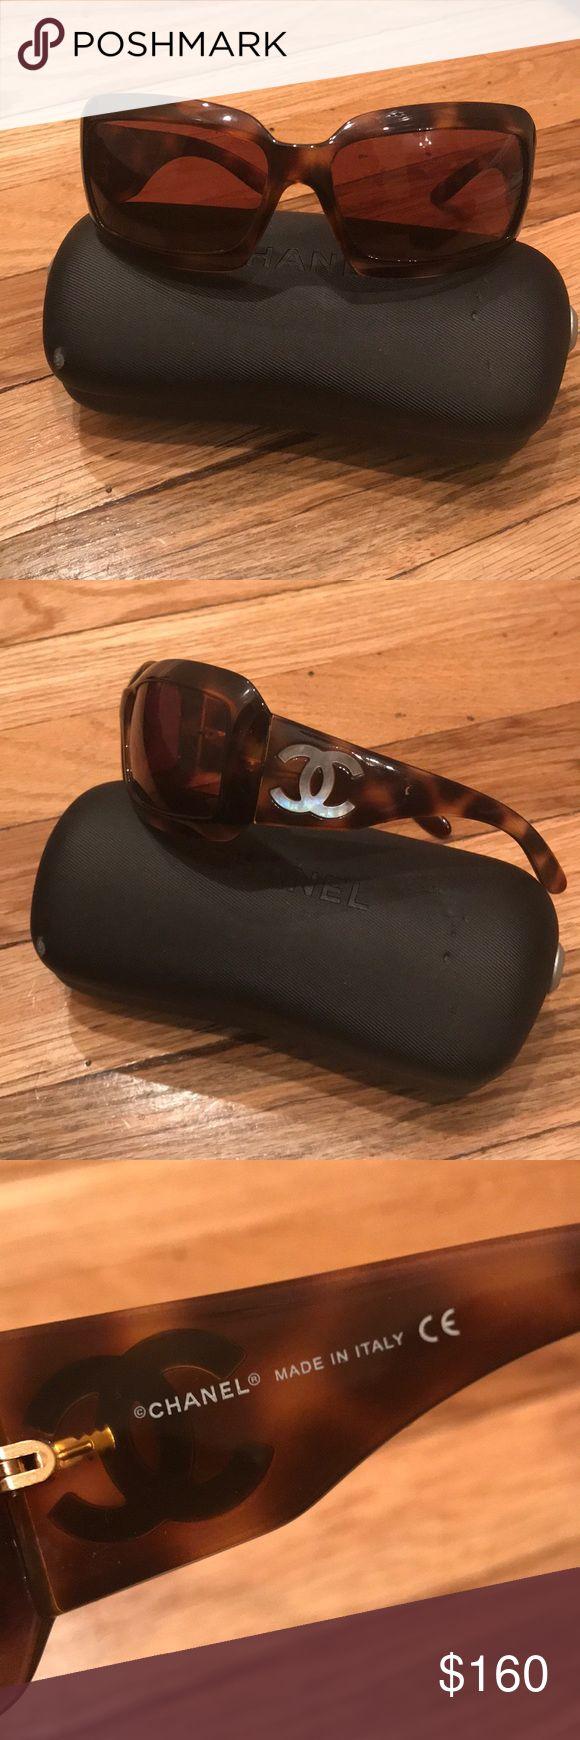 Chanel sunglasses Tortoise color wrap around, few scratches.. Very comfortable sunglasses CHANEL Accessories Sunglasses